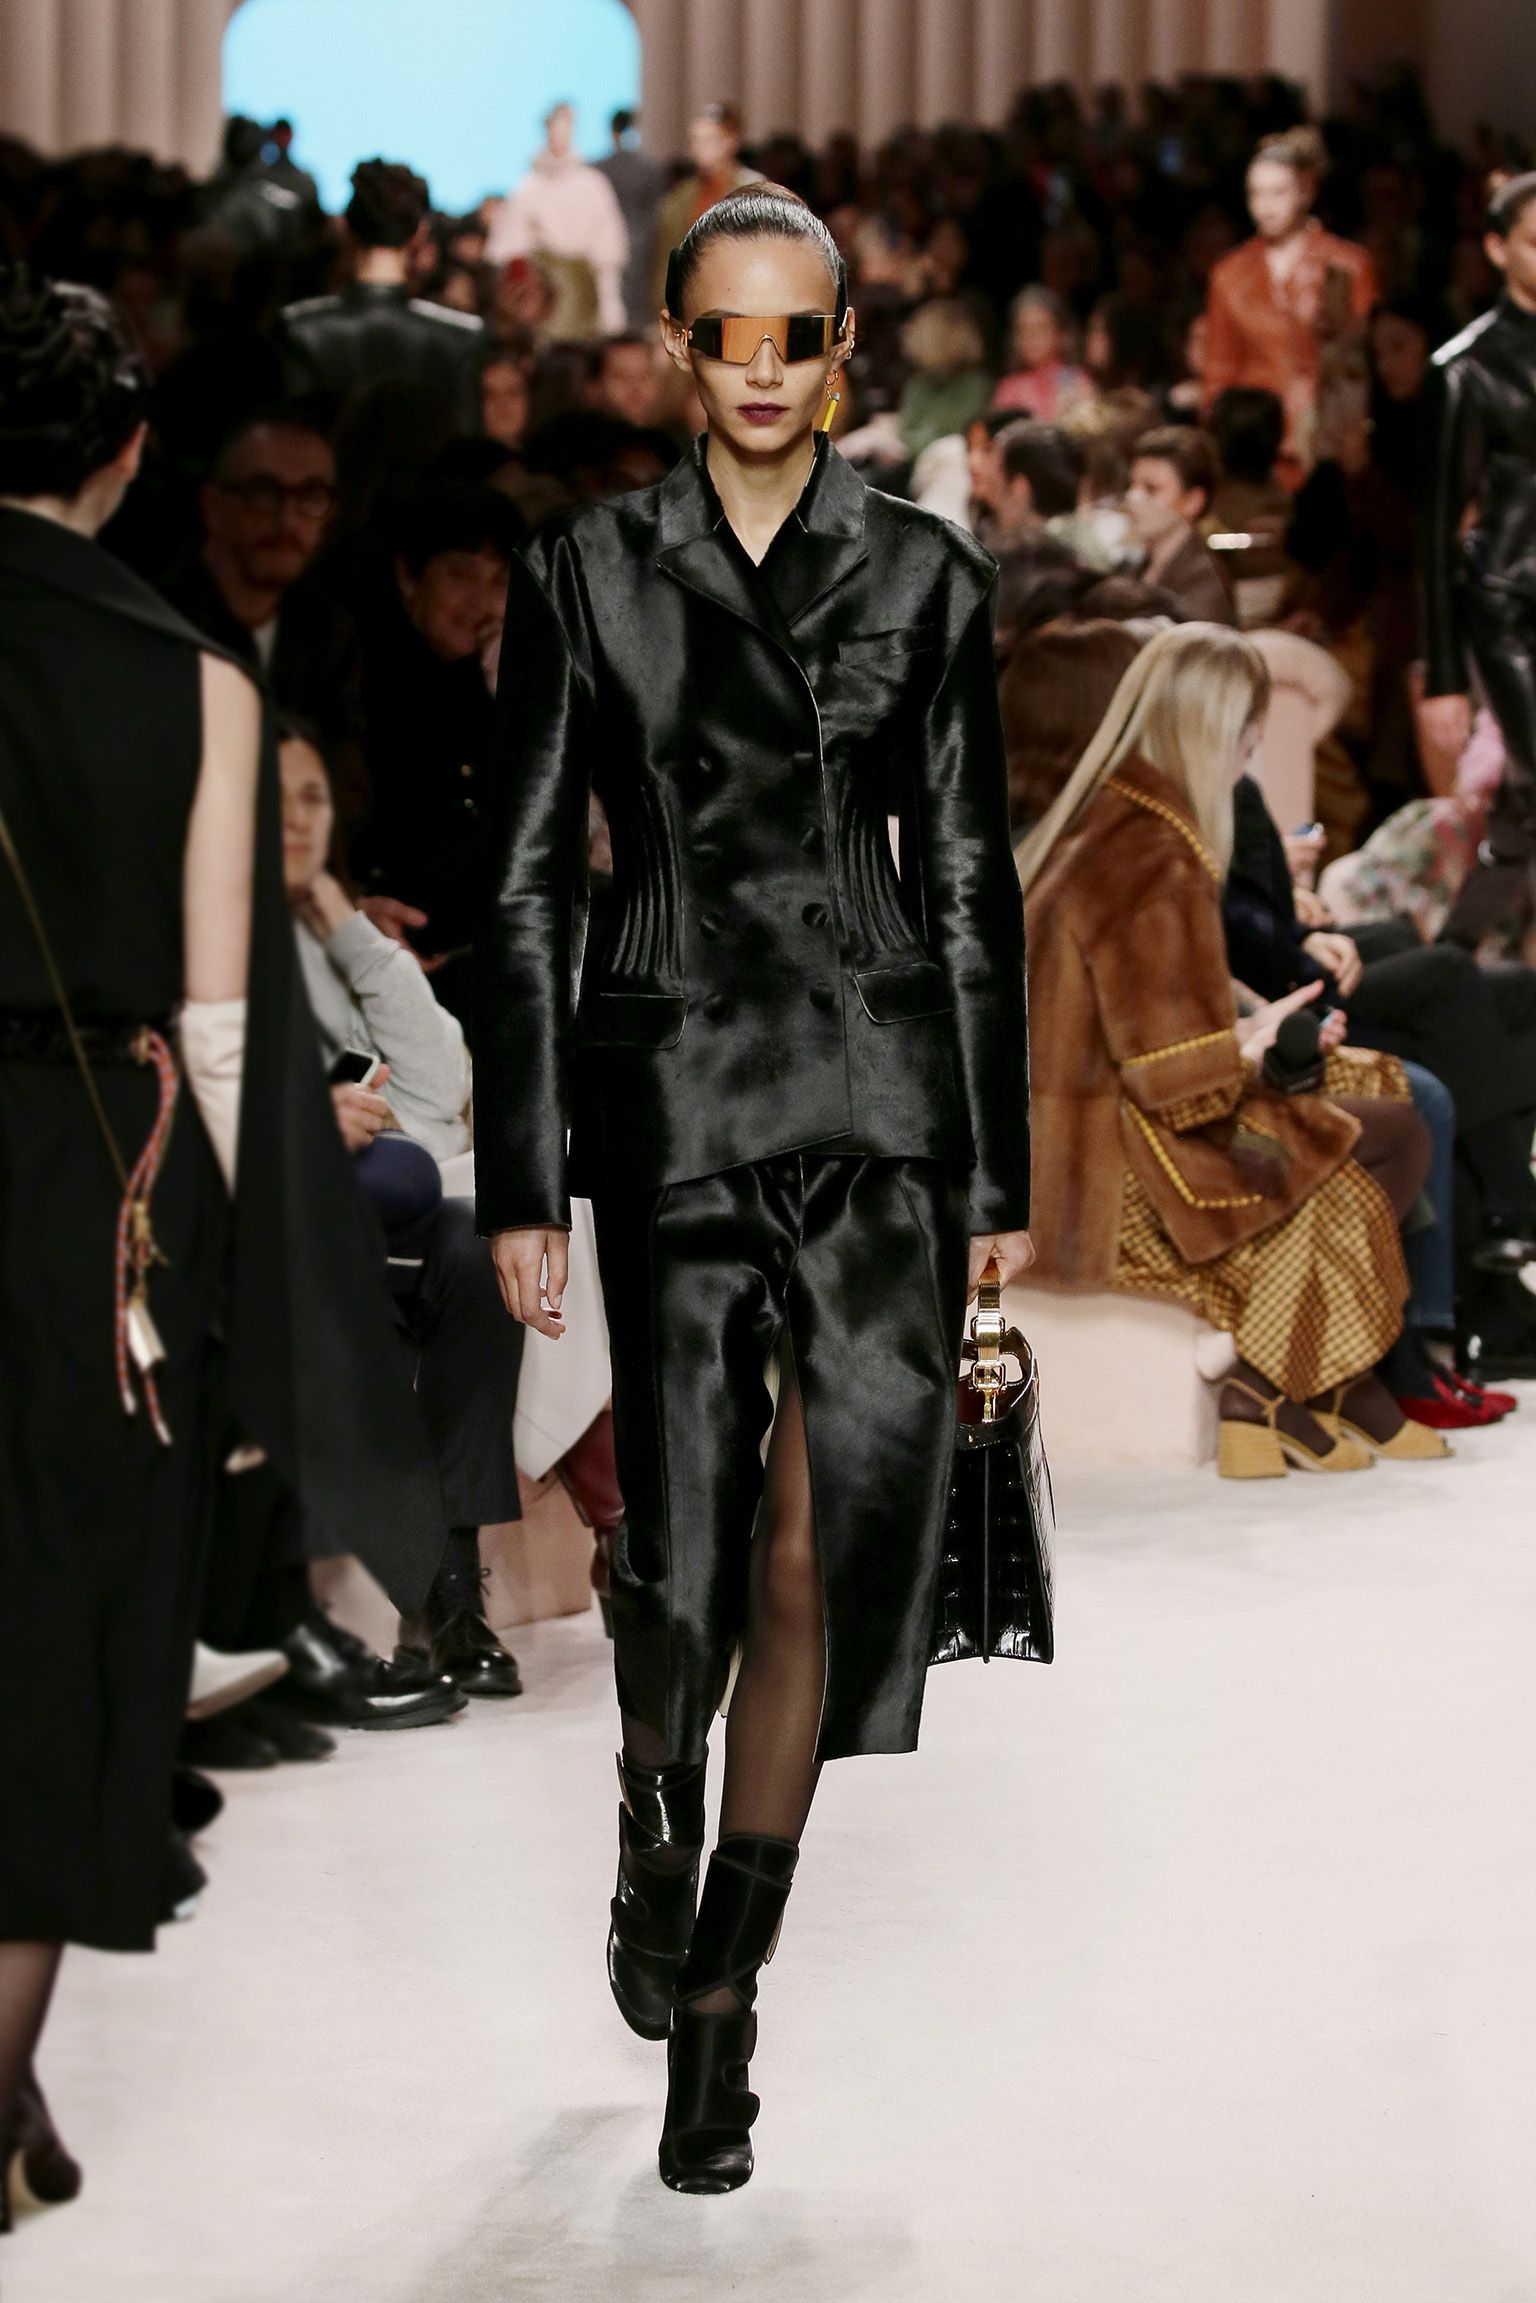 Women S Fall Winter 2020 21 Fashion Show Creative Director Silvia Venturini Fendi In 2020 With Images High Fashion Looks Fendi Fashion Show